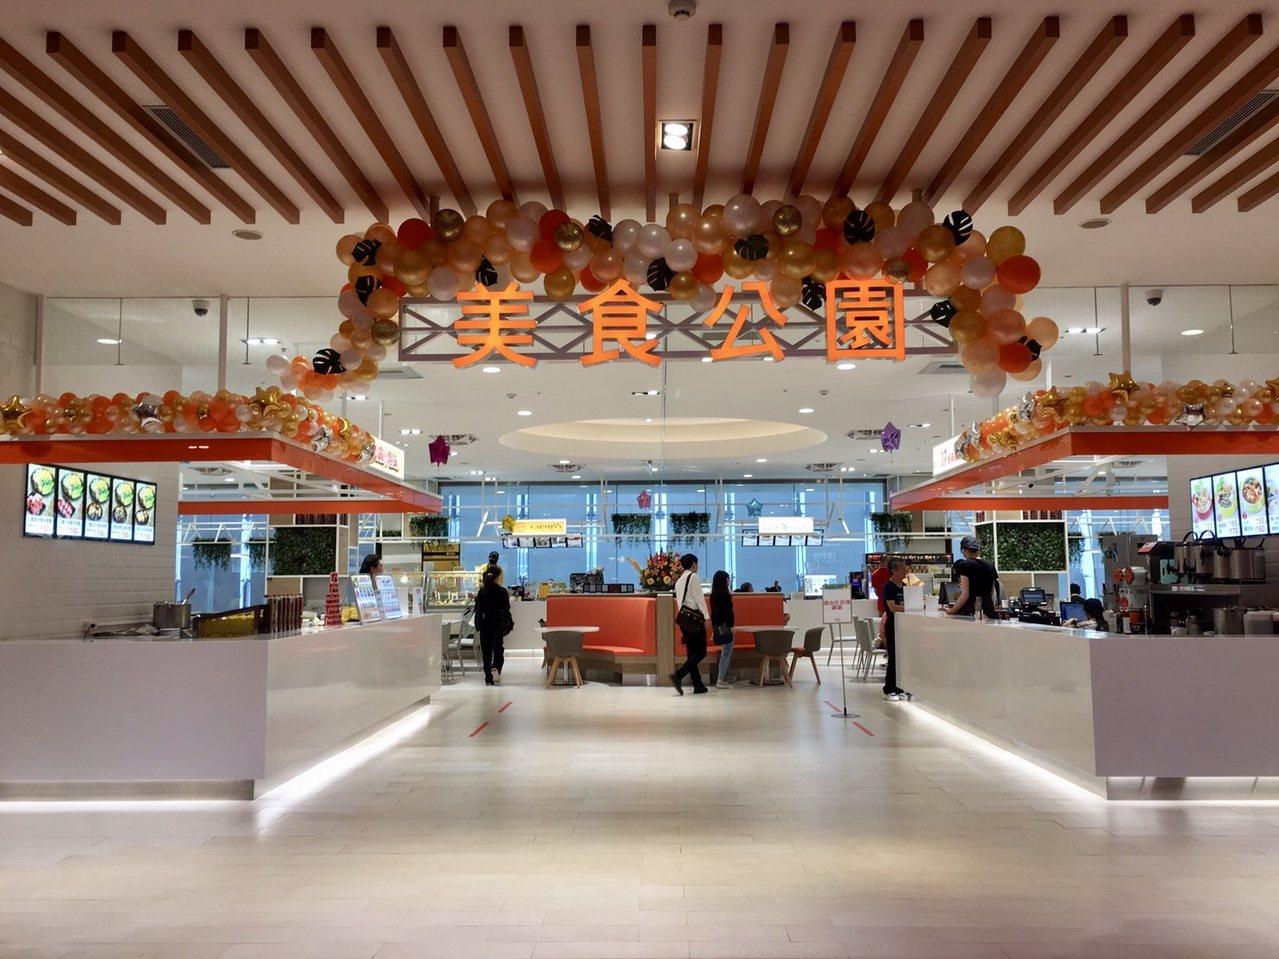 SOGO天母店小吃街改裝,以「美食公園」為主題新開幕。圖/SOGO提供